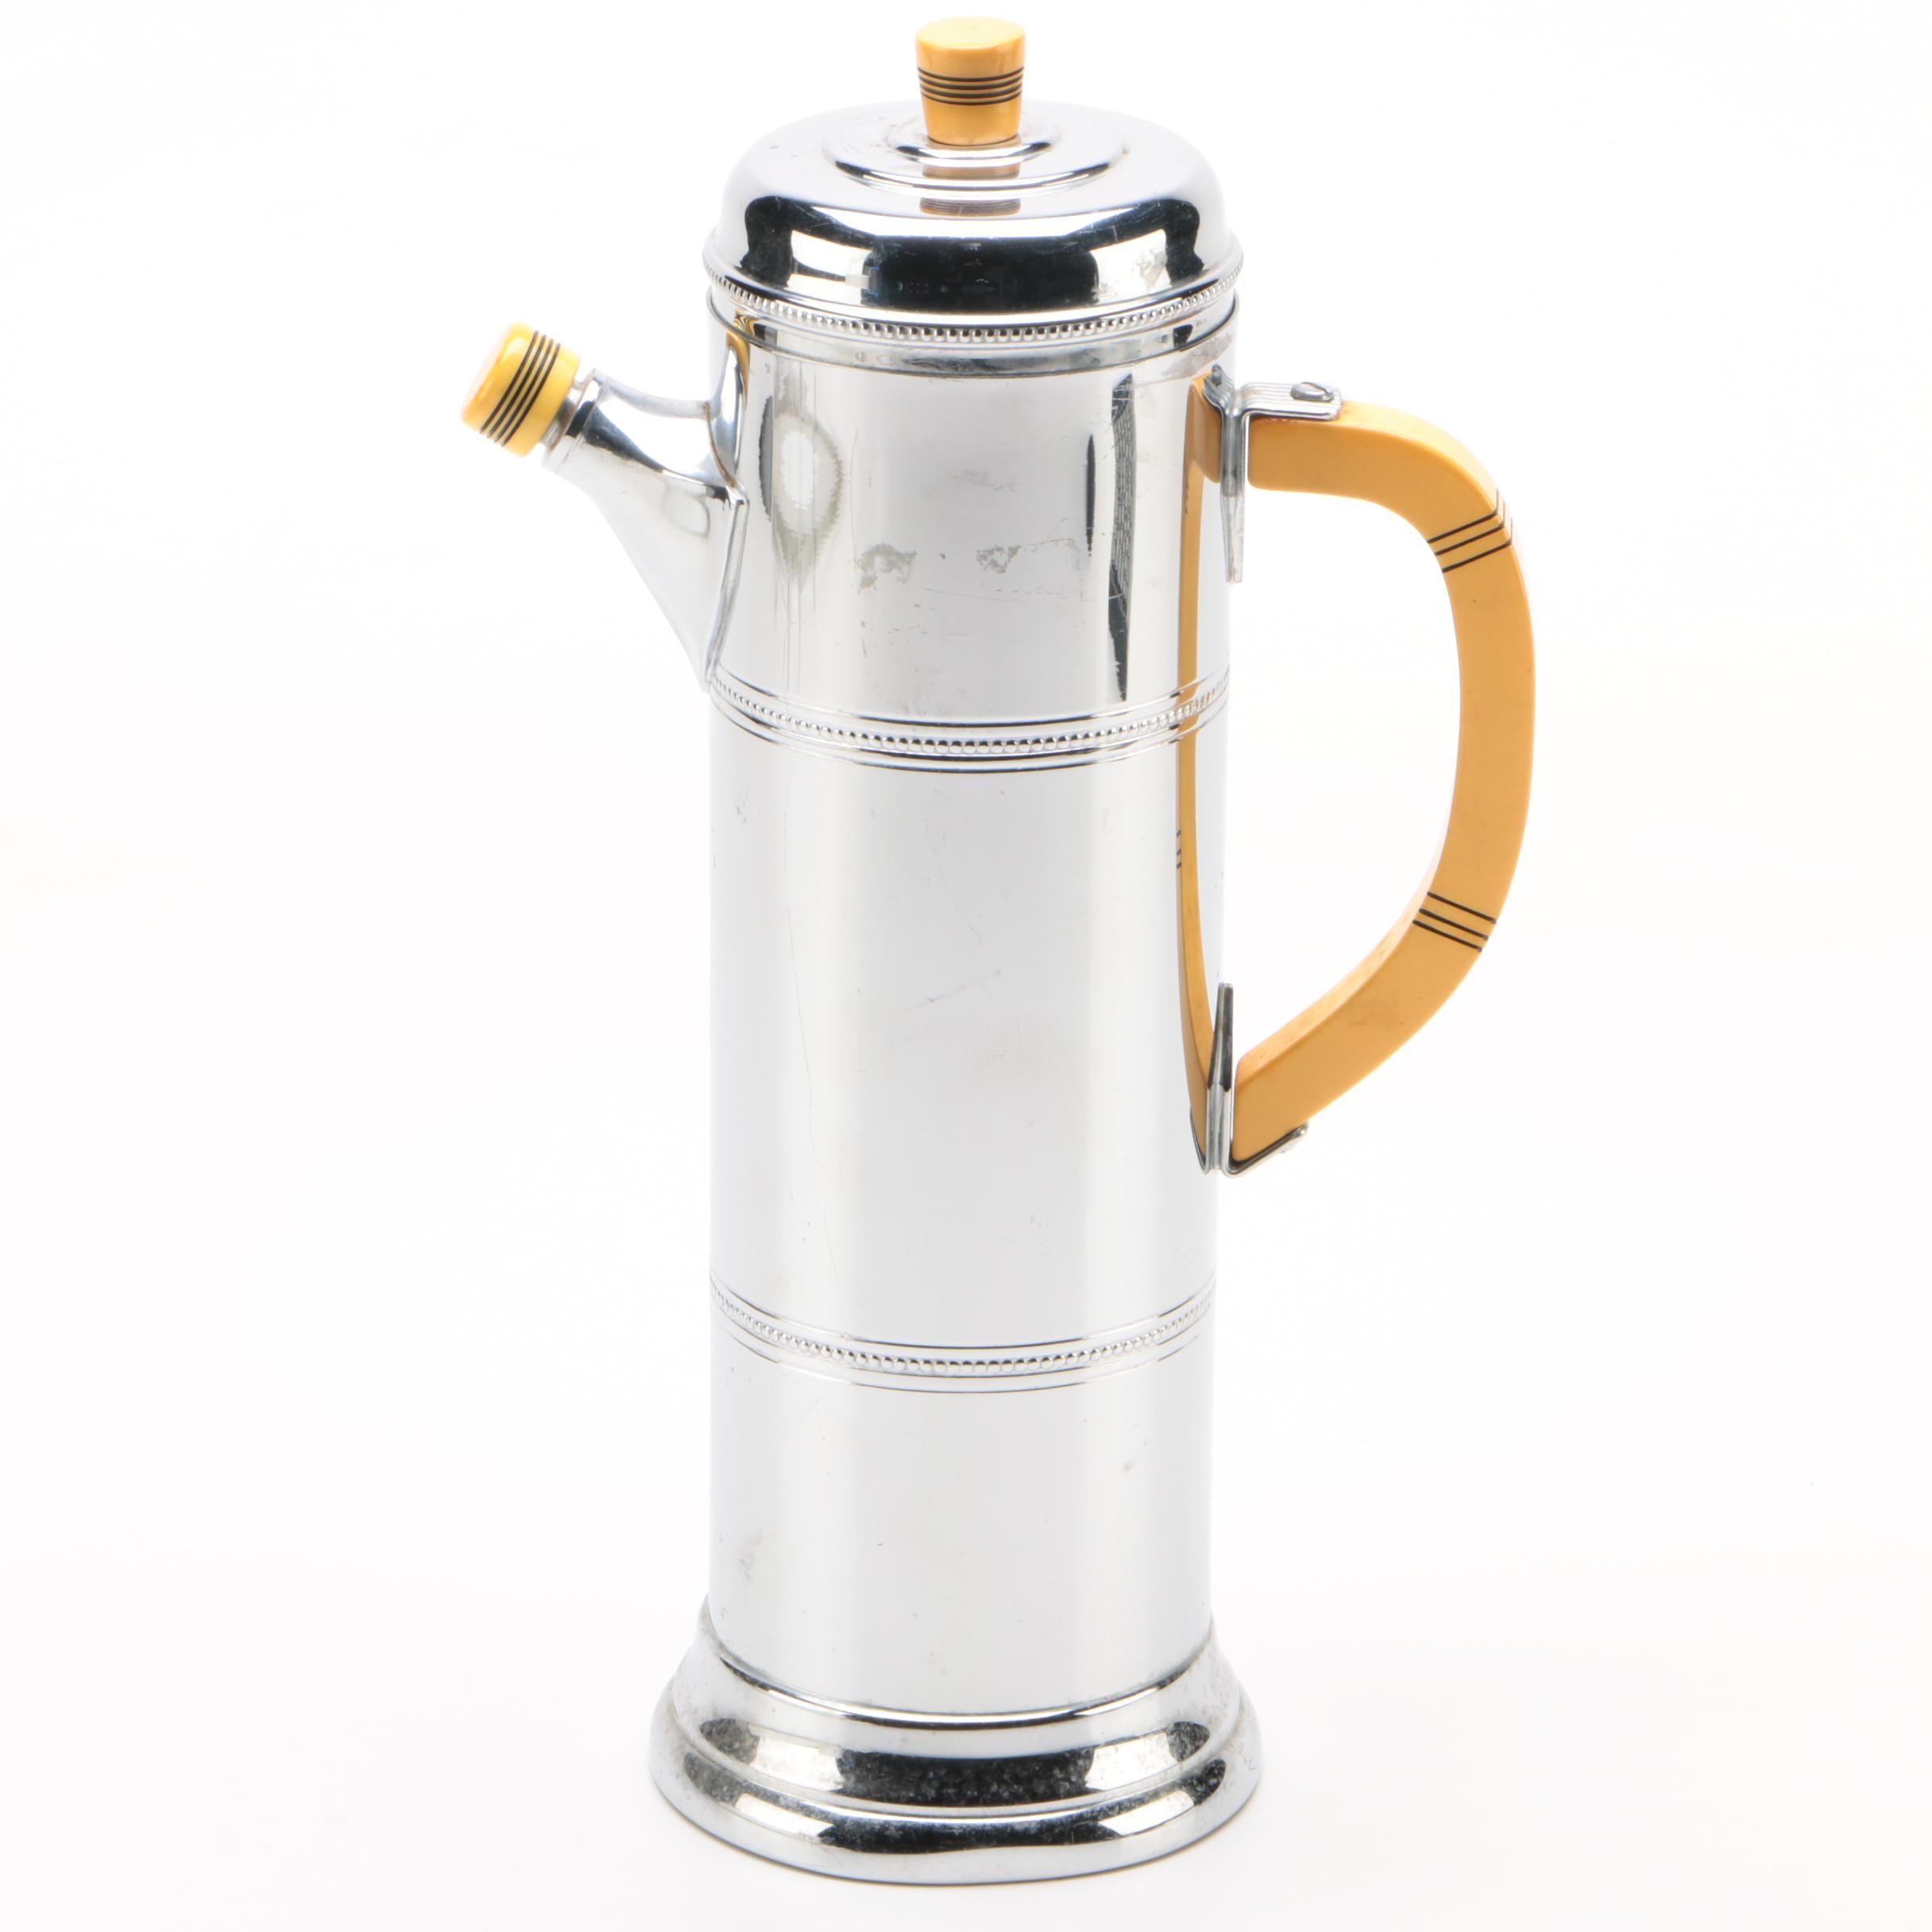 Farber Bros. Krome Kraft and Bakelite Cocktail Shaker, Mid-Century